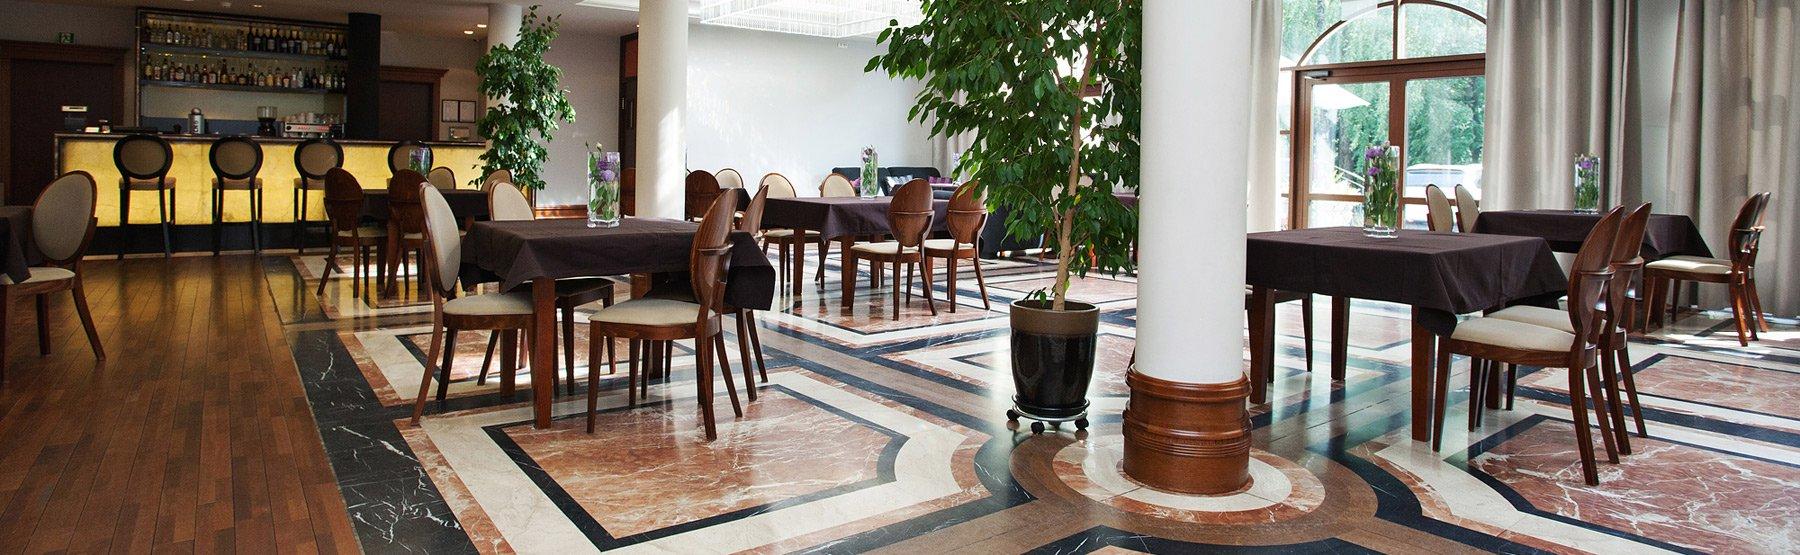 Hotel Suwałki Akvilon Restauracja